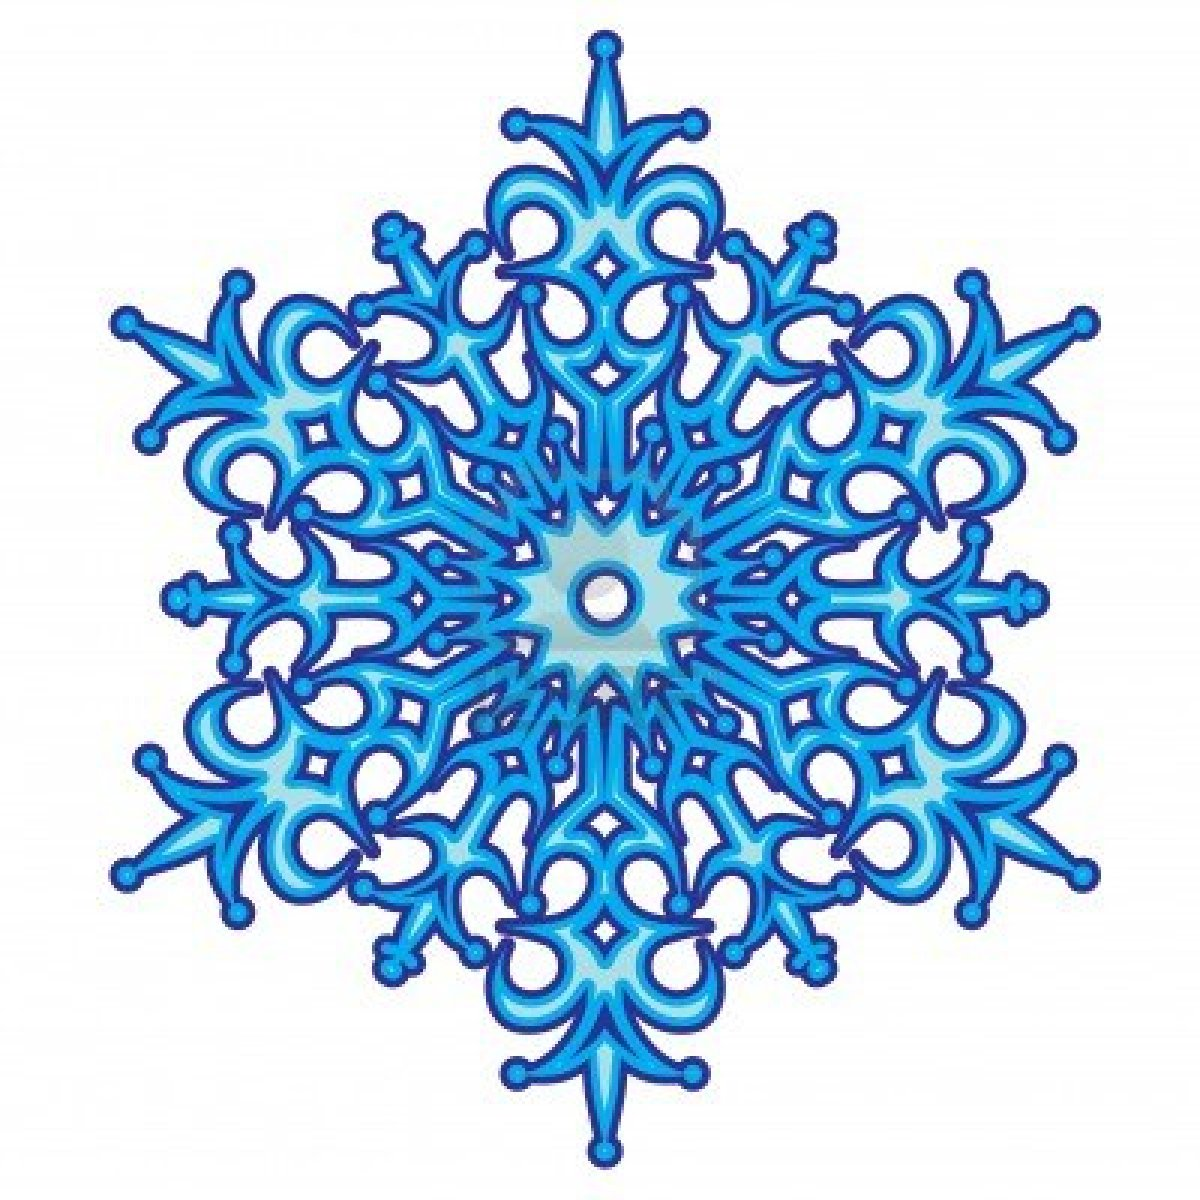 1200x1200 Snowflake clipart tumblr transparent